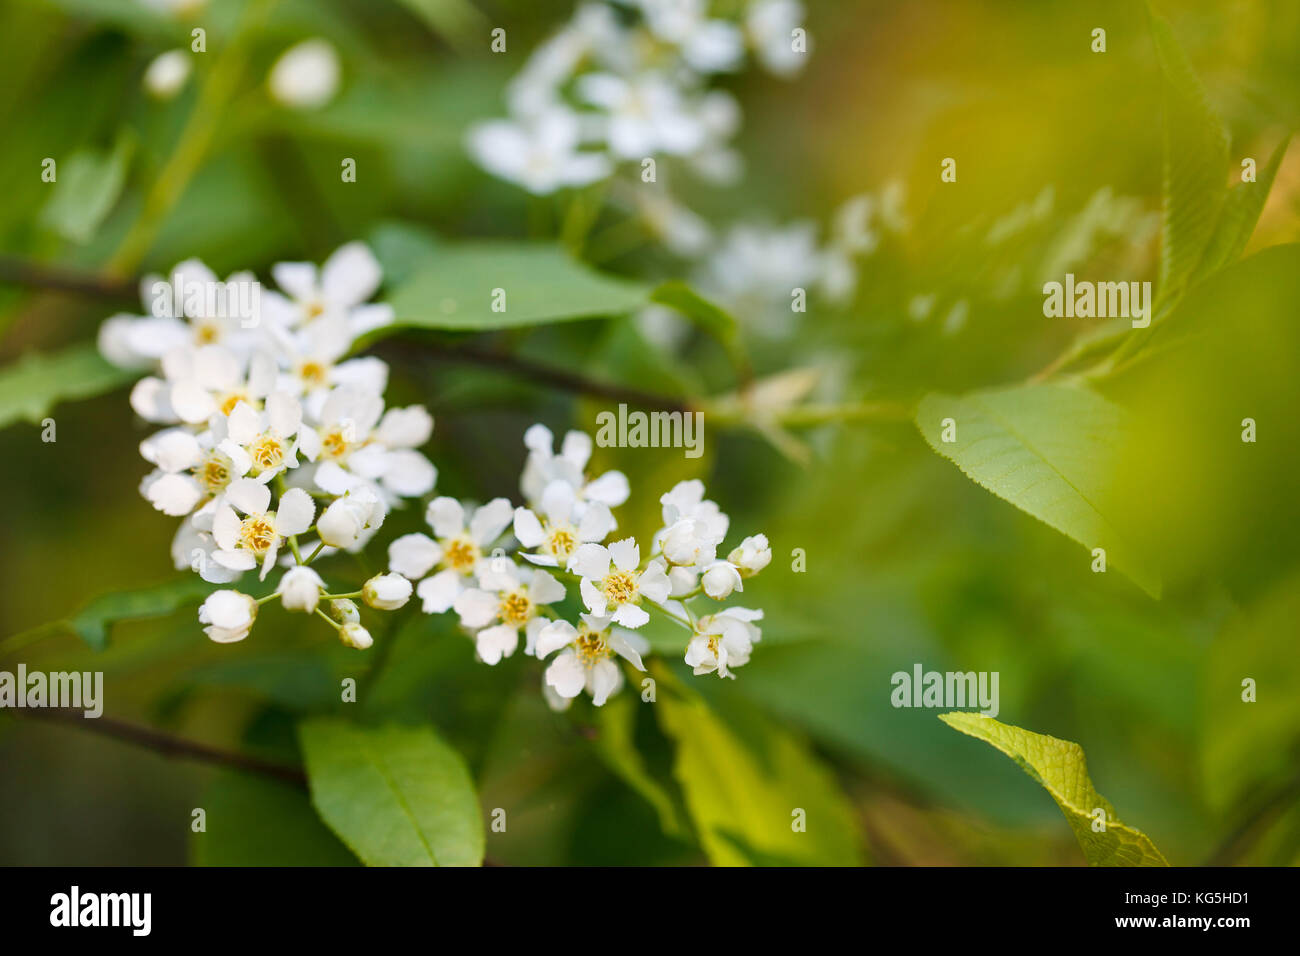 bird cherry, Prunus padus, twig, blossoms - Stock Image